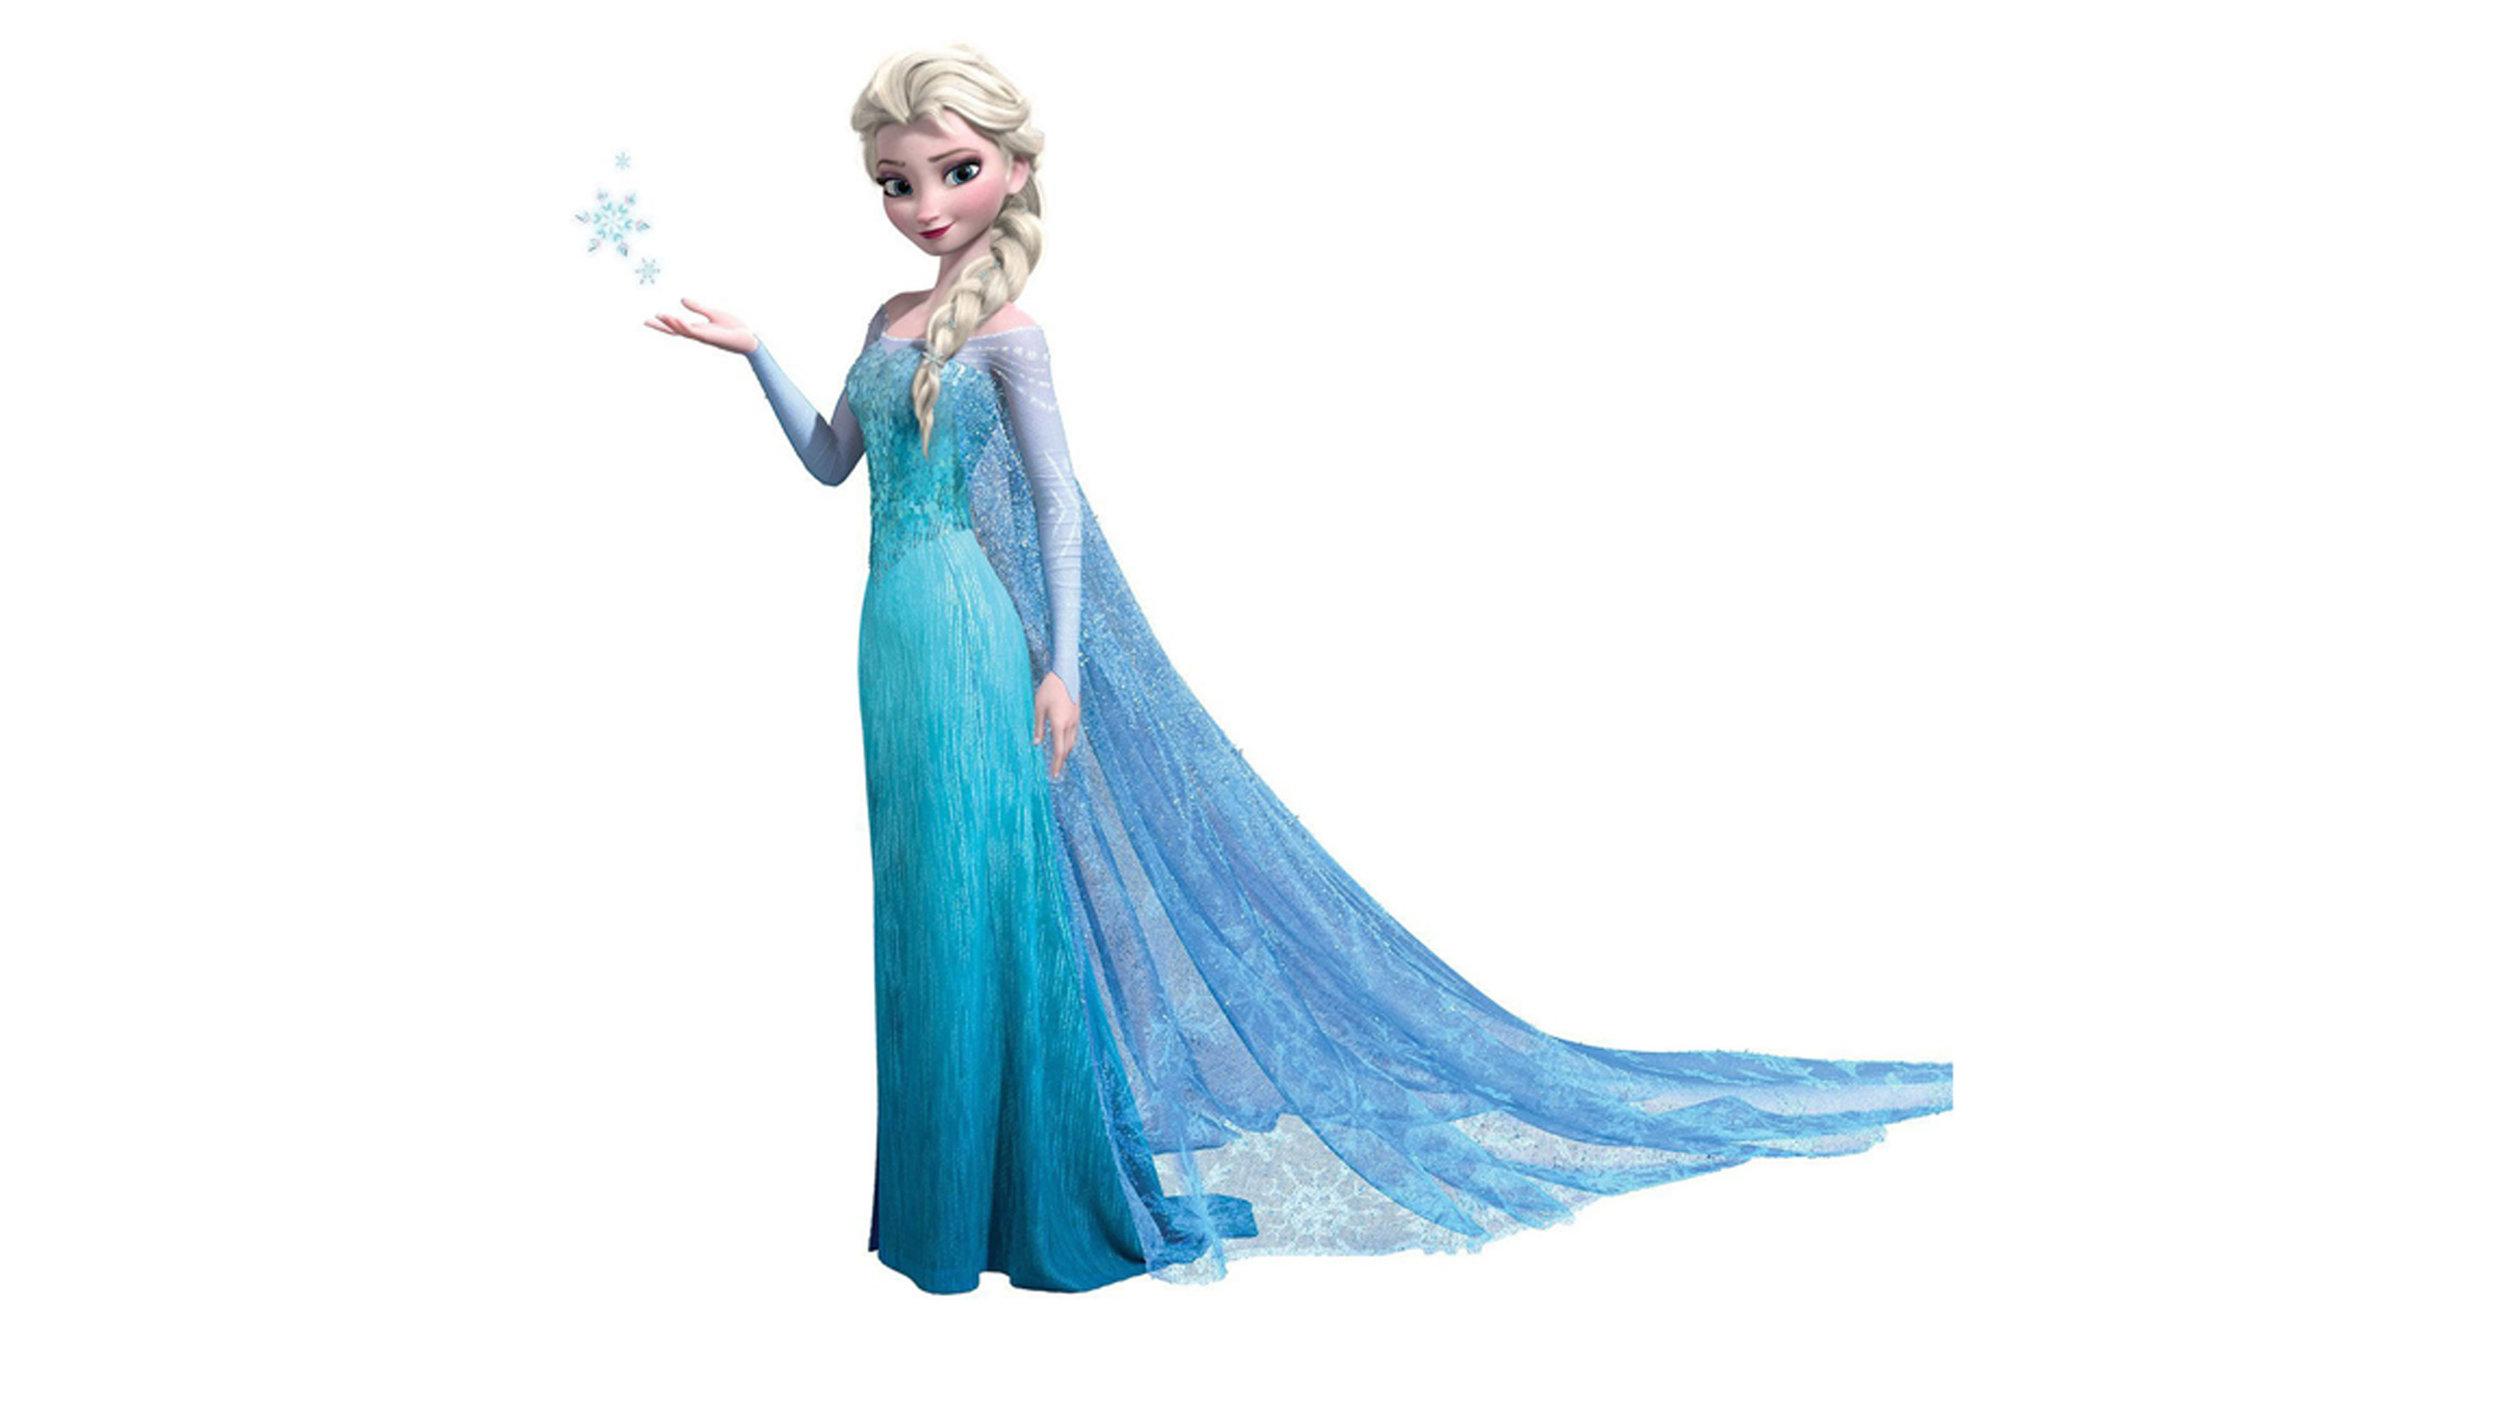 Elsa from Frozen.